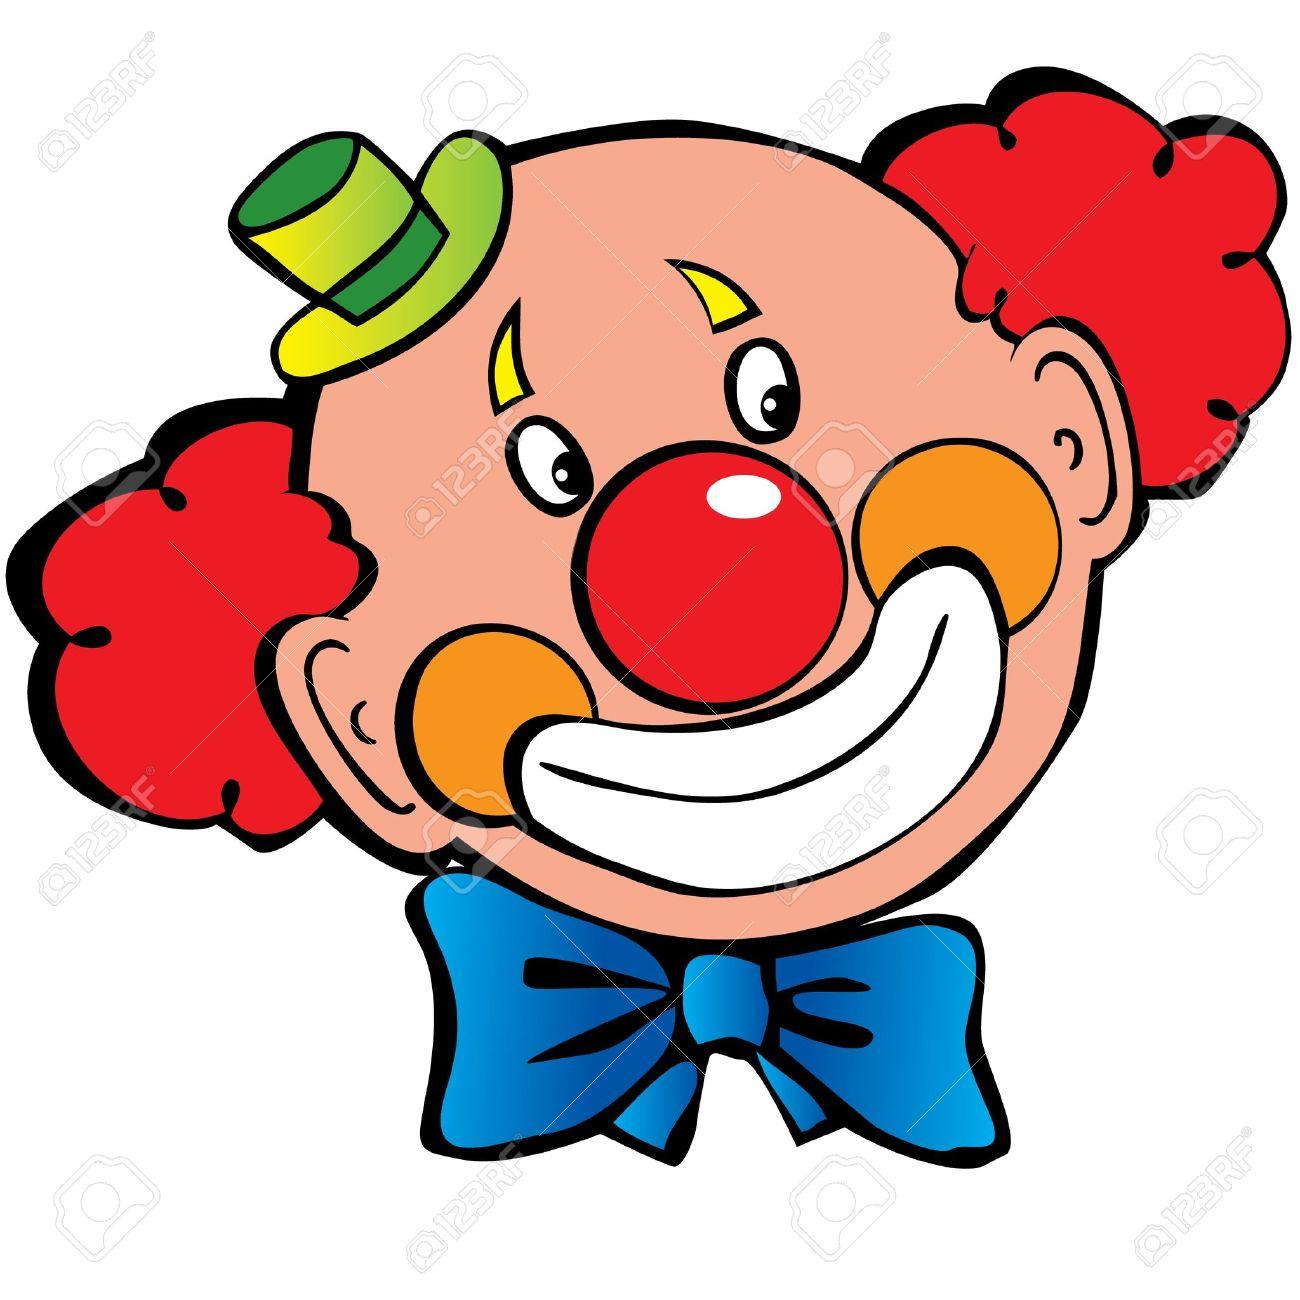 clowns: Happy clown art-illus - Clowns Clipart